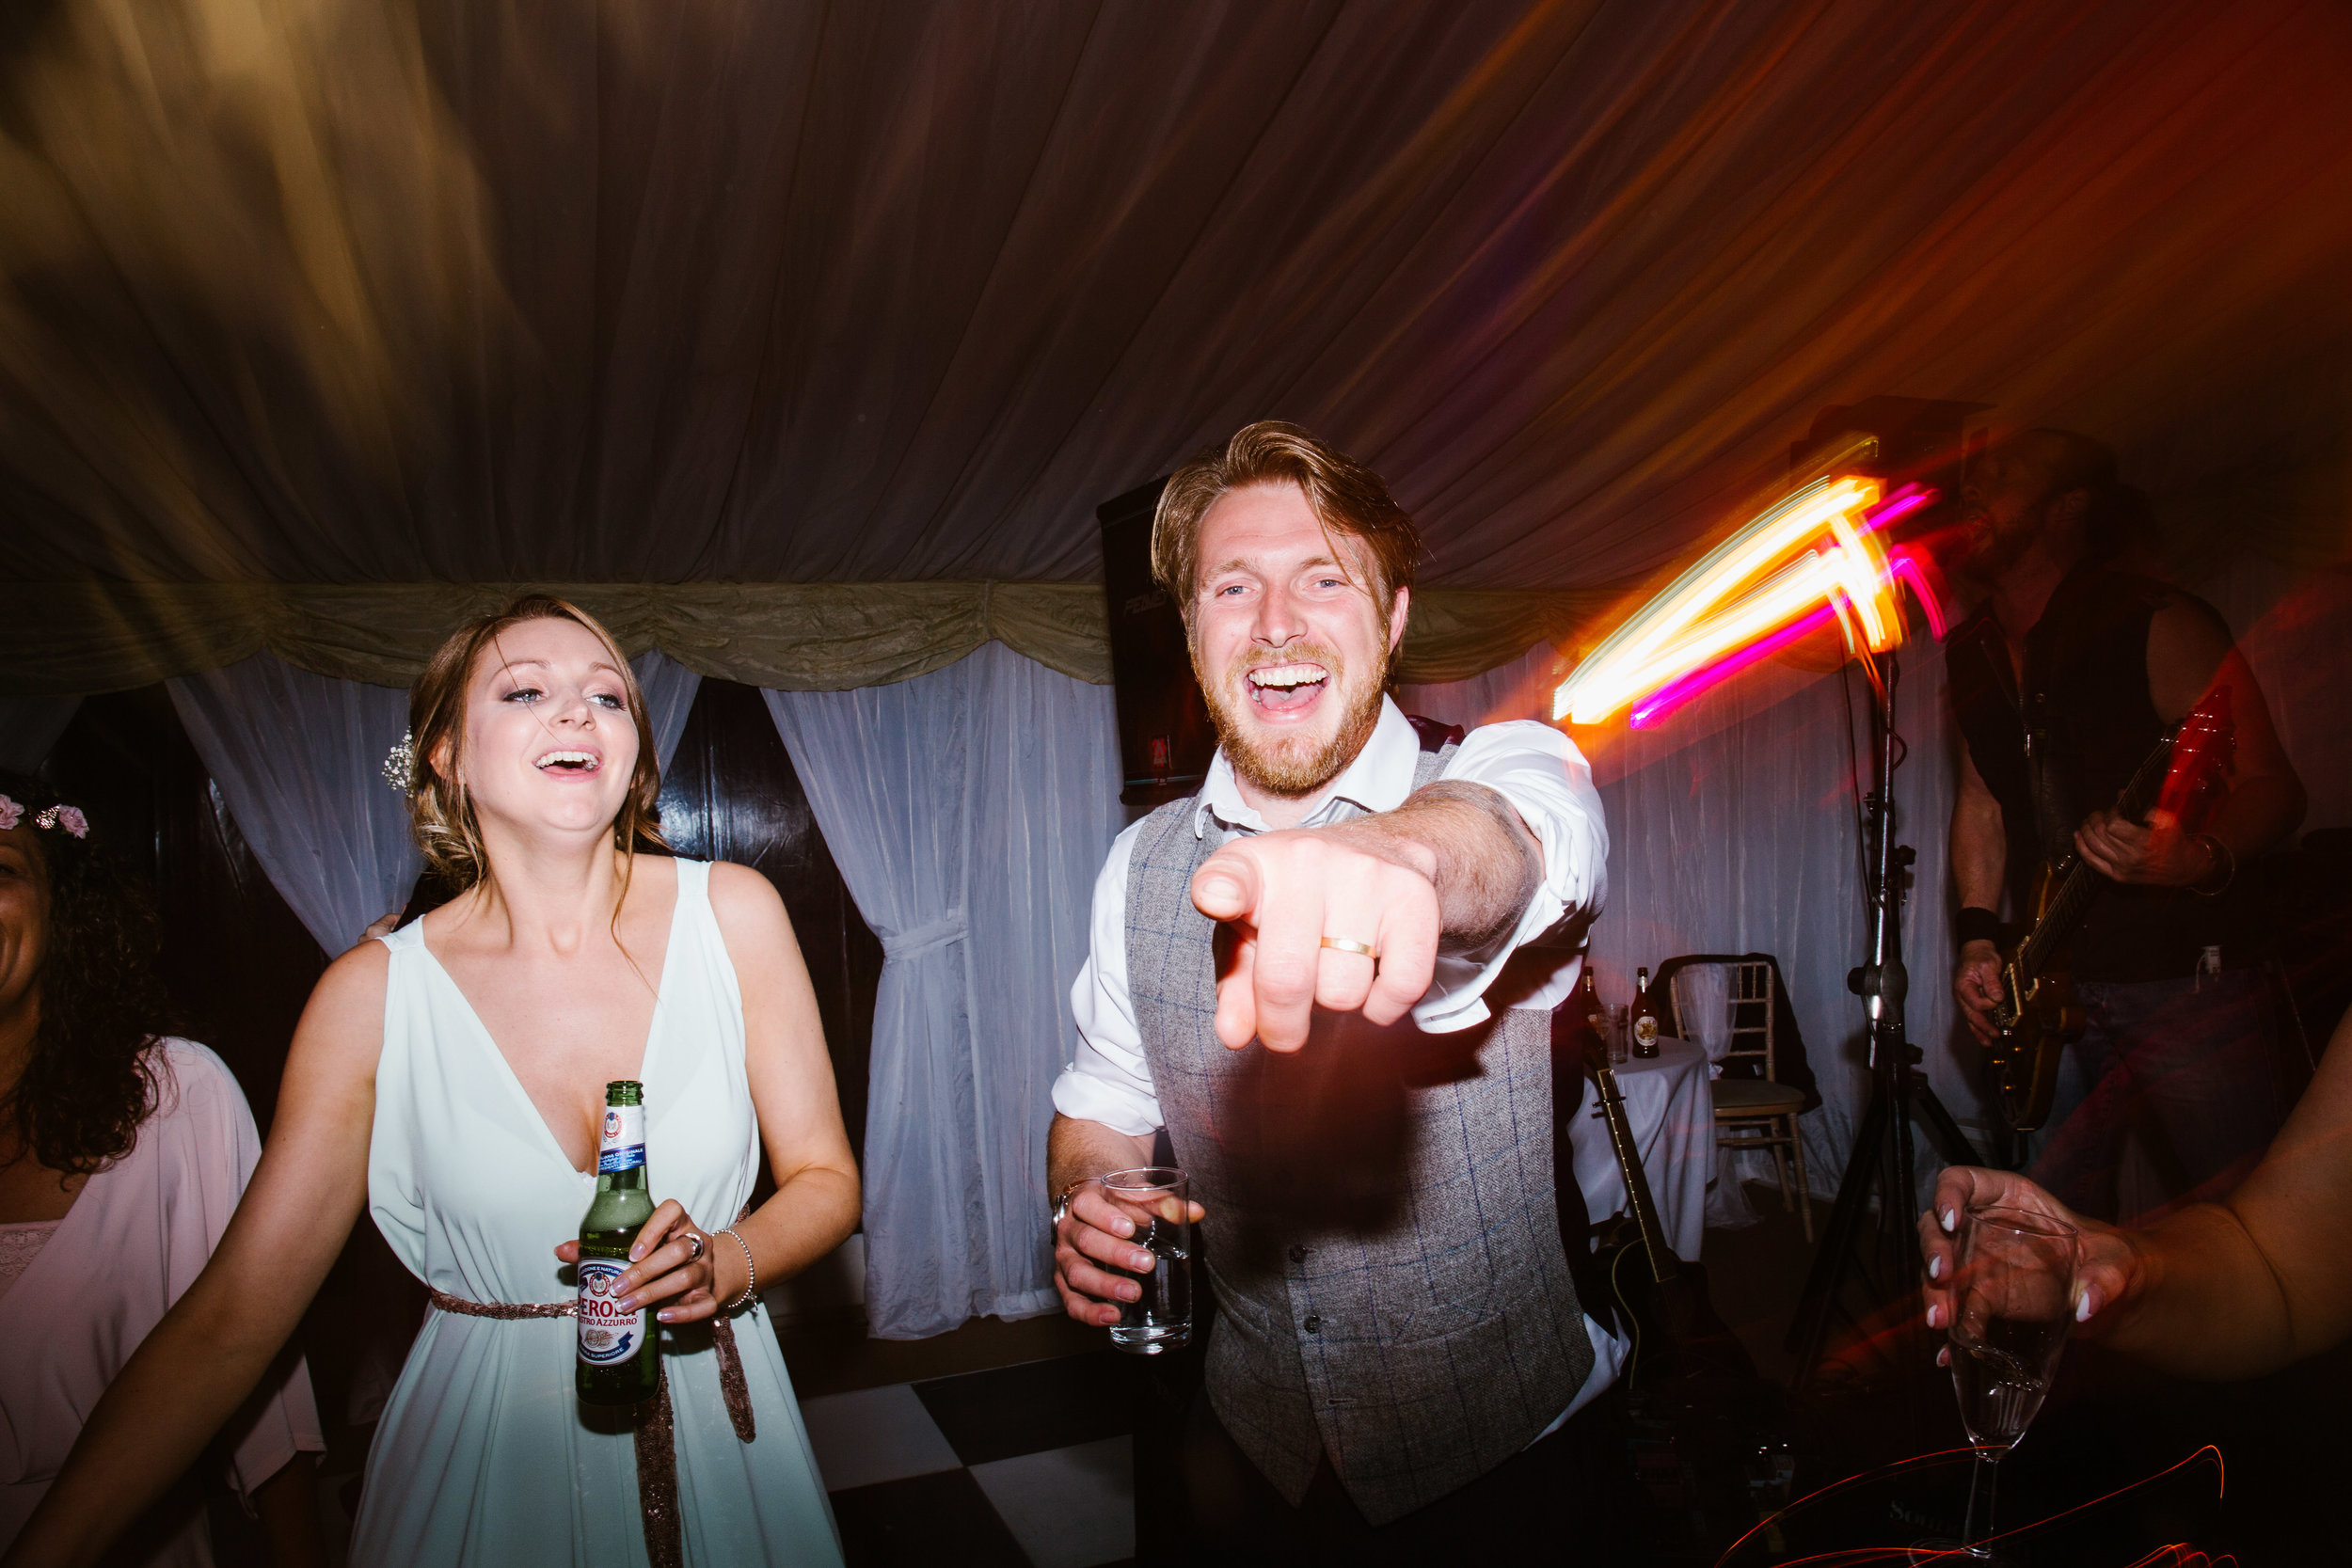 Staffordshire wedding, Staffordshire wedding photographer, marquee wedding, wedding fun-347.jpg